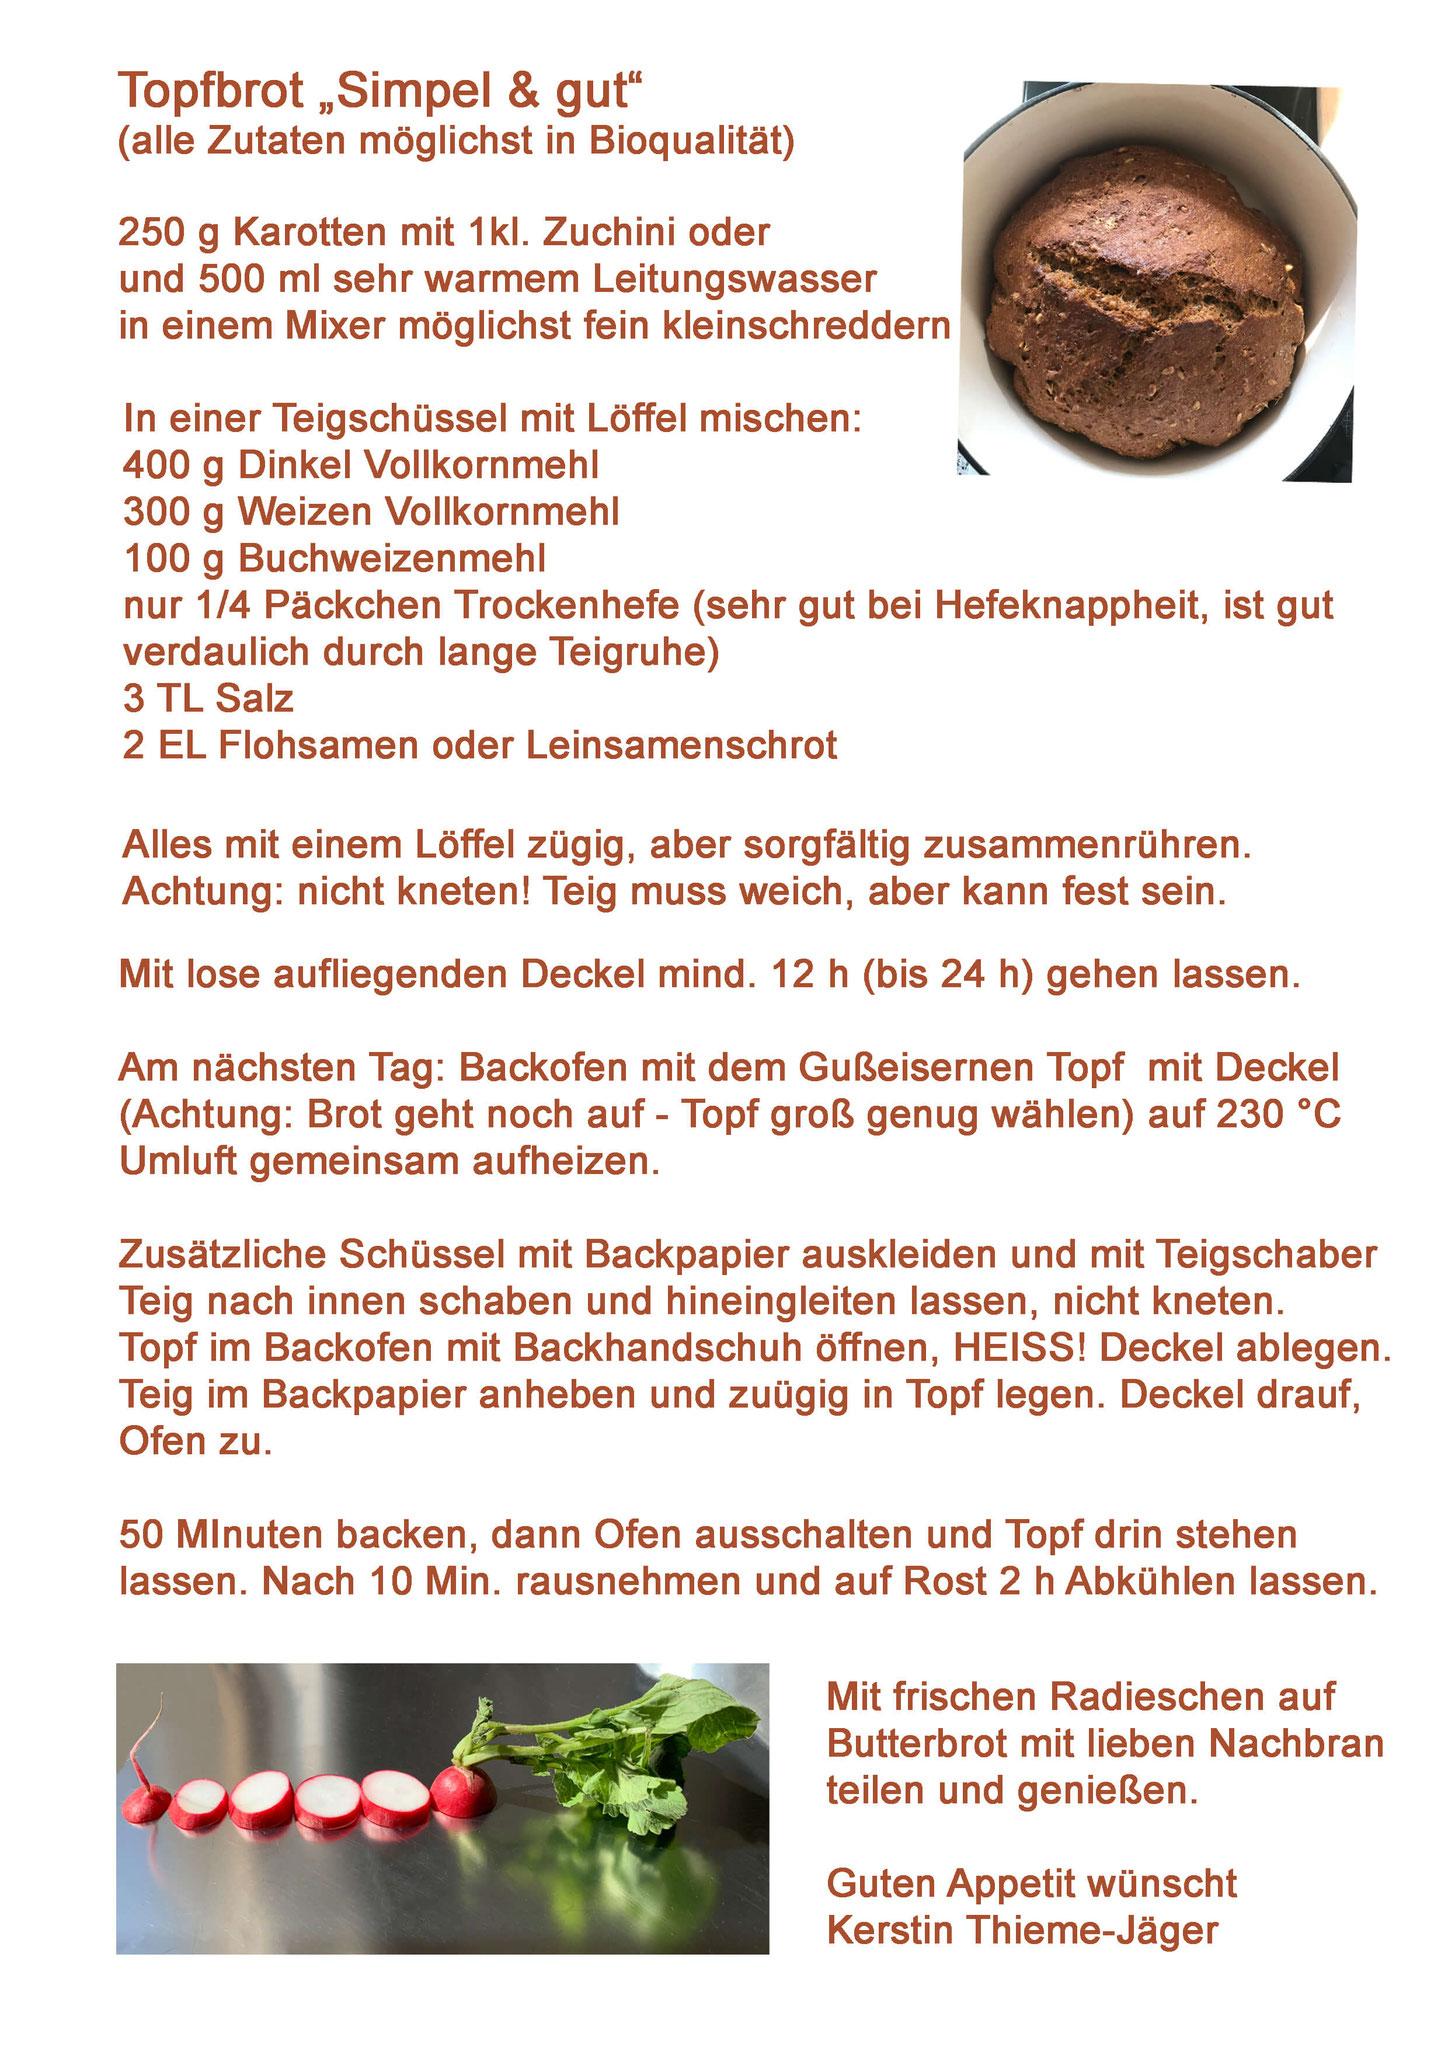 17b Topfbrot-Rezept, Thieme-Jäger